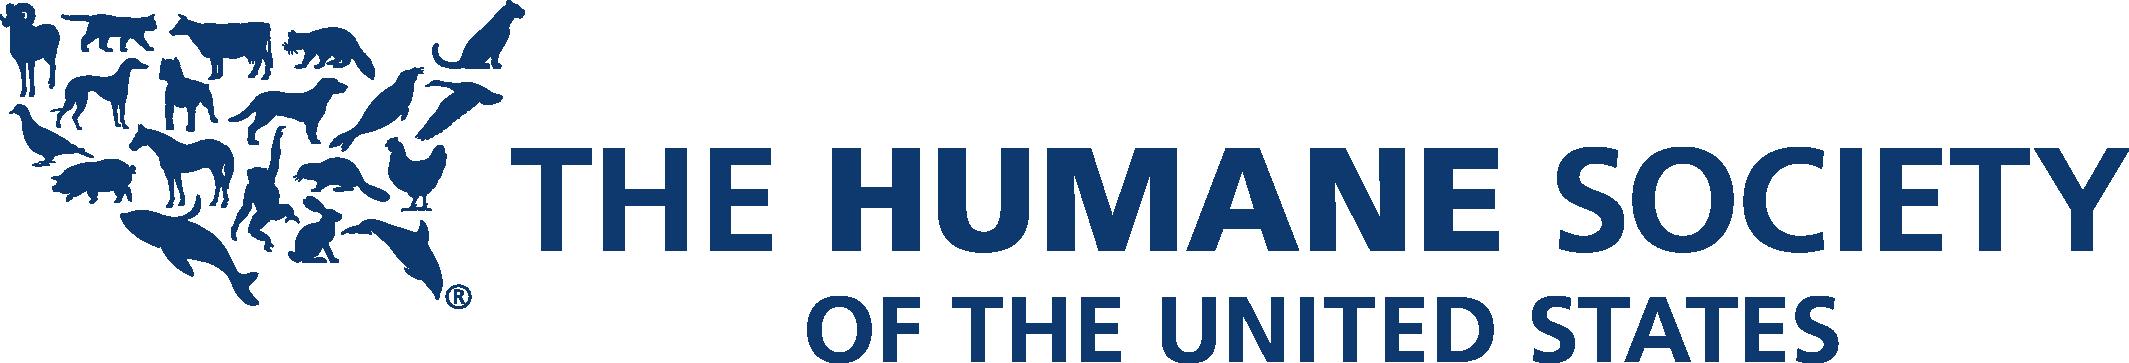 HUMANE SOCIETY OF US.png